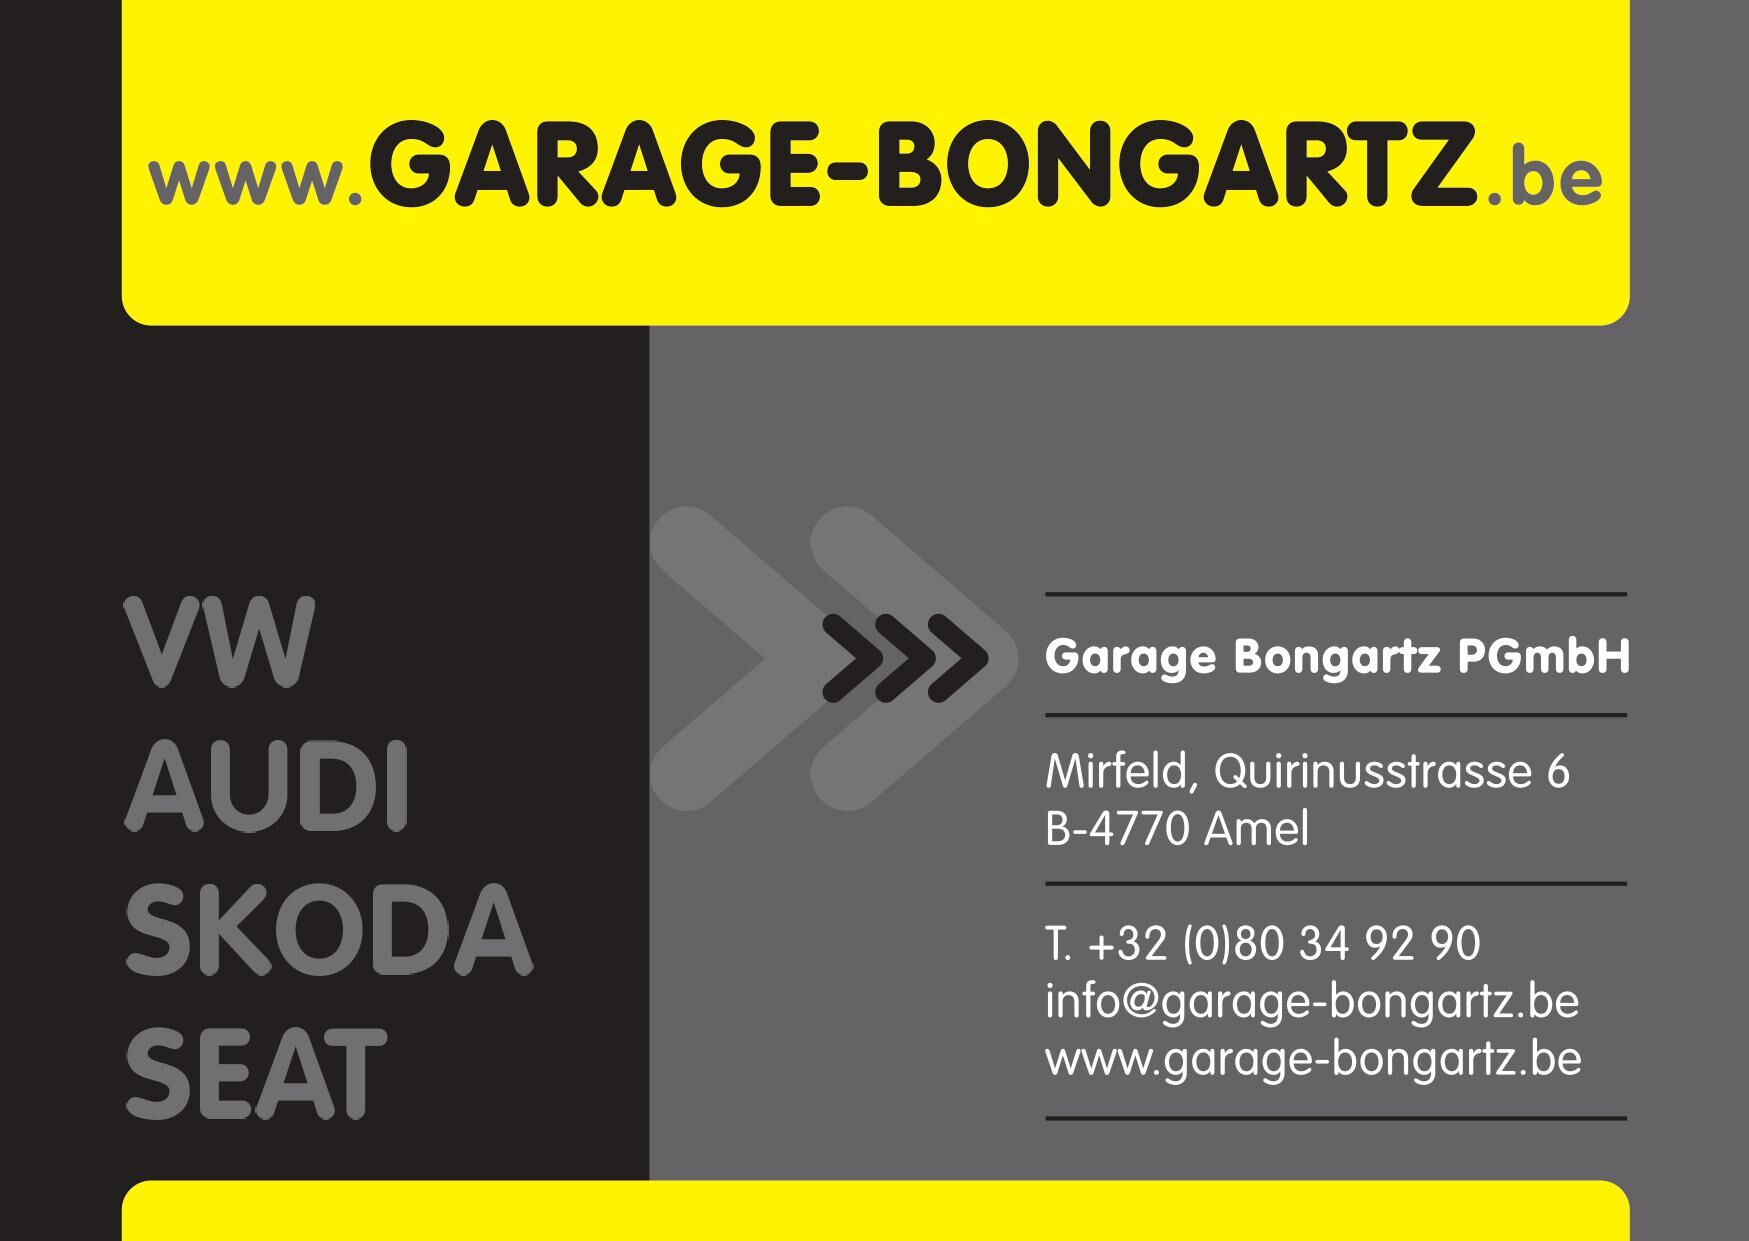 Garage Bongartz